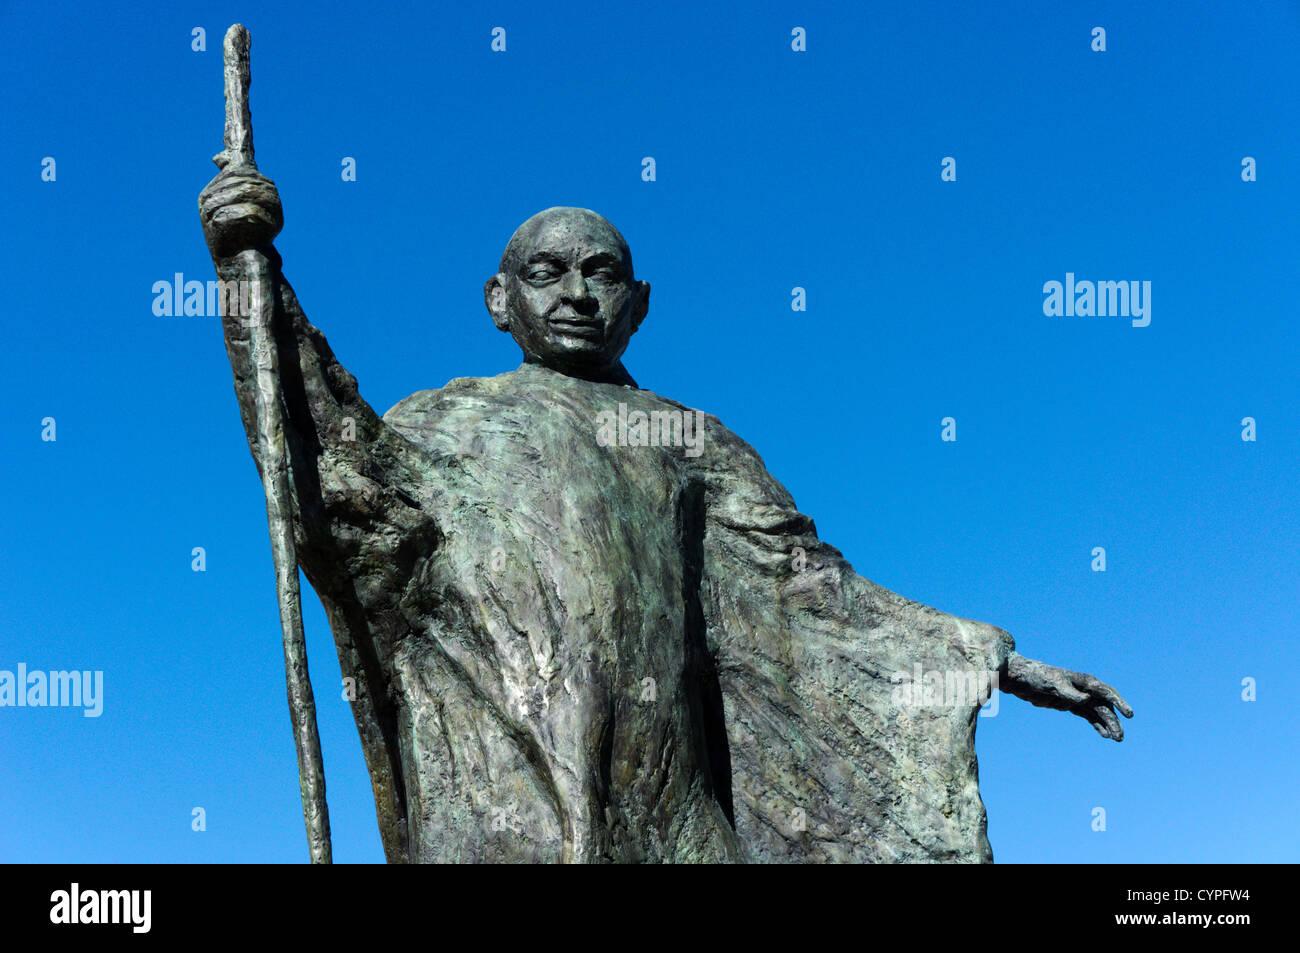 A statue of Mahatma Gandhi. - Stock Image